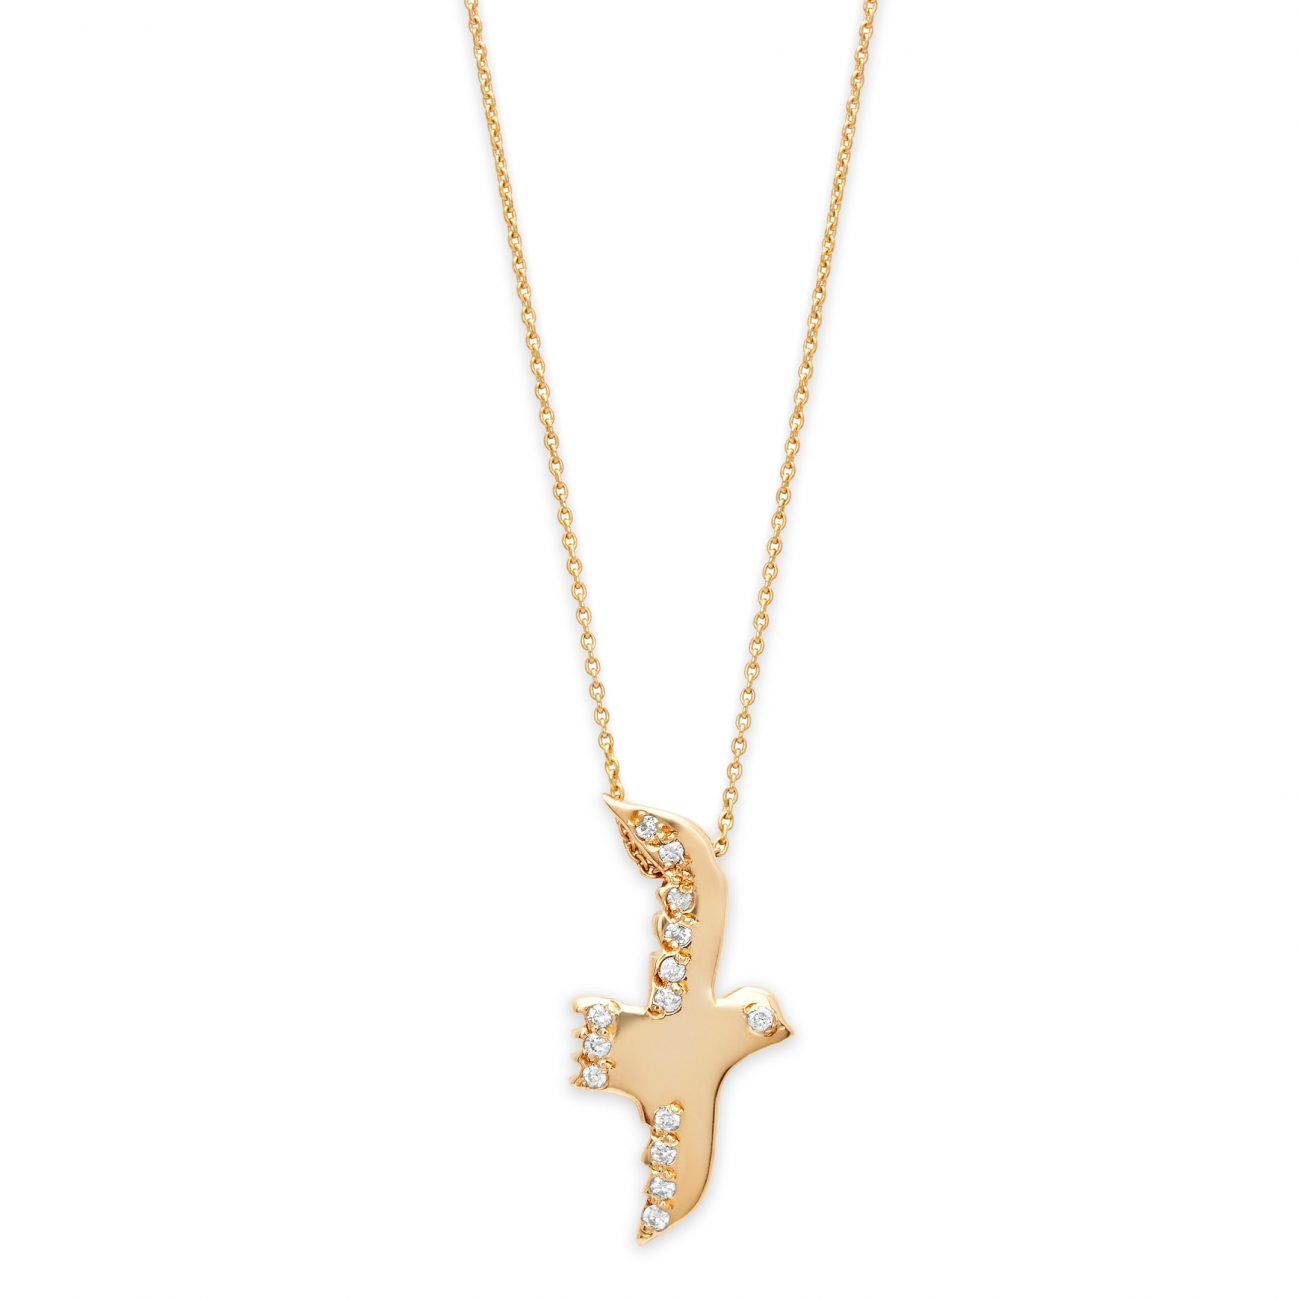 Necklace_FlyingBird